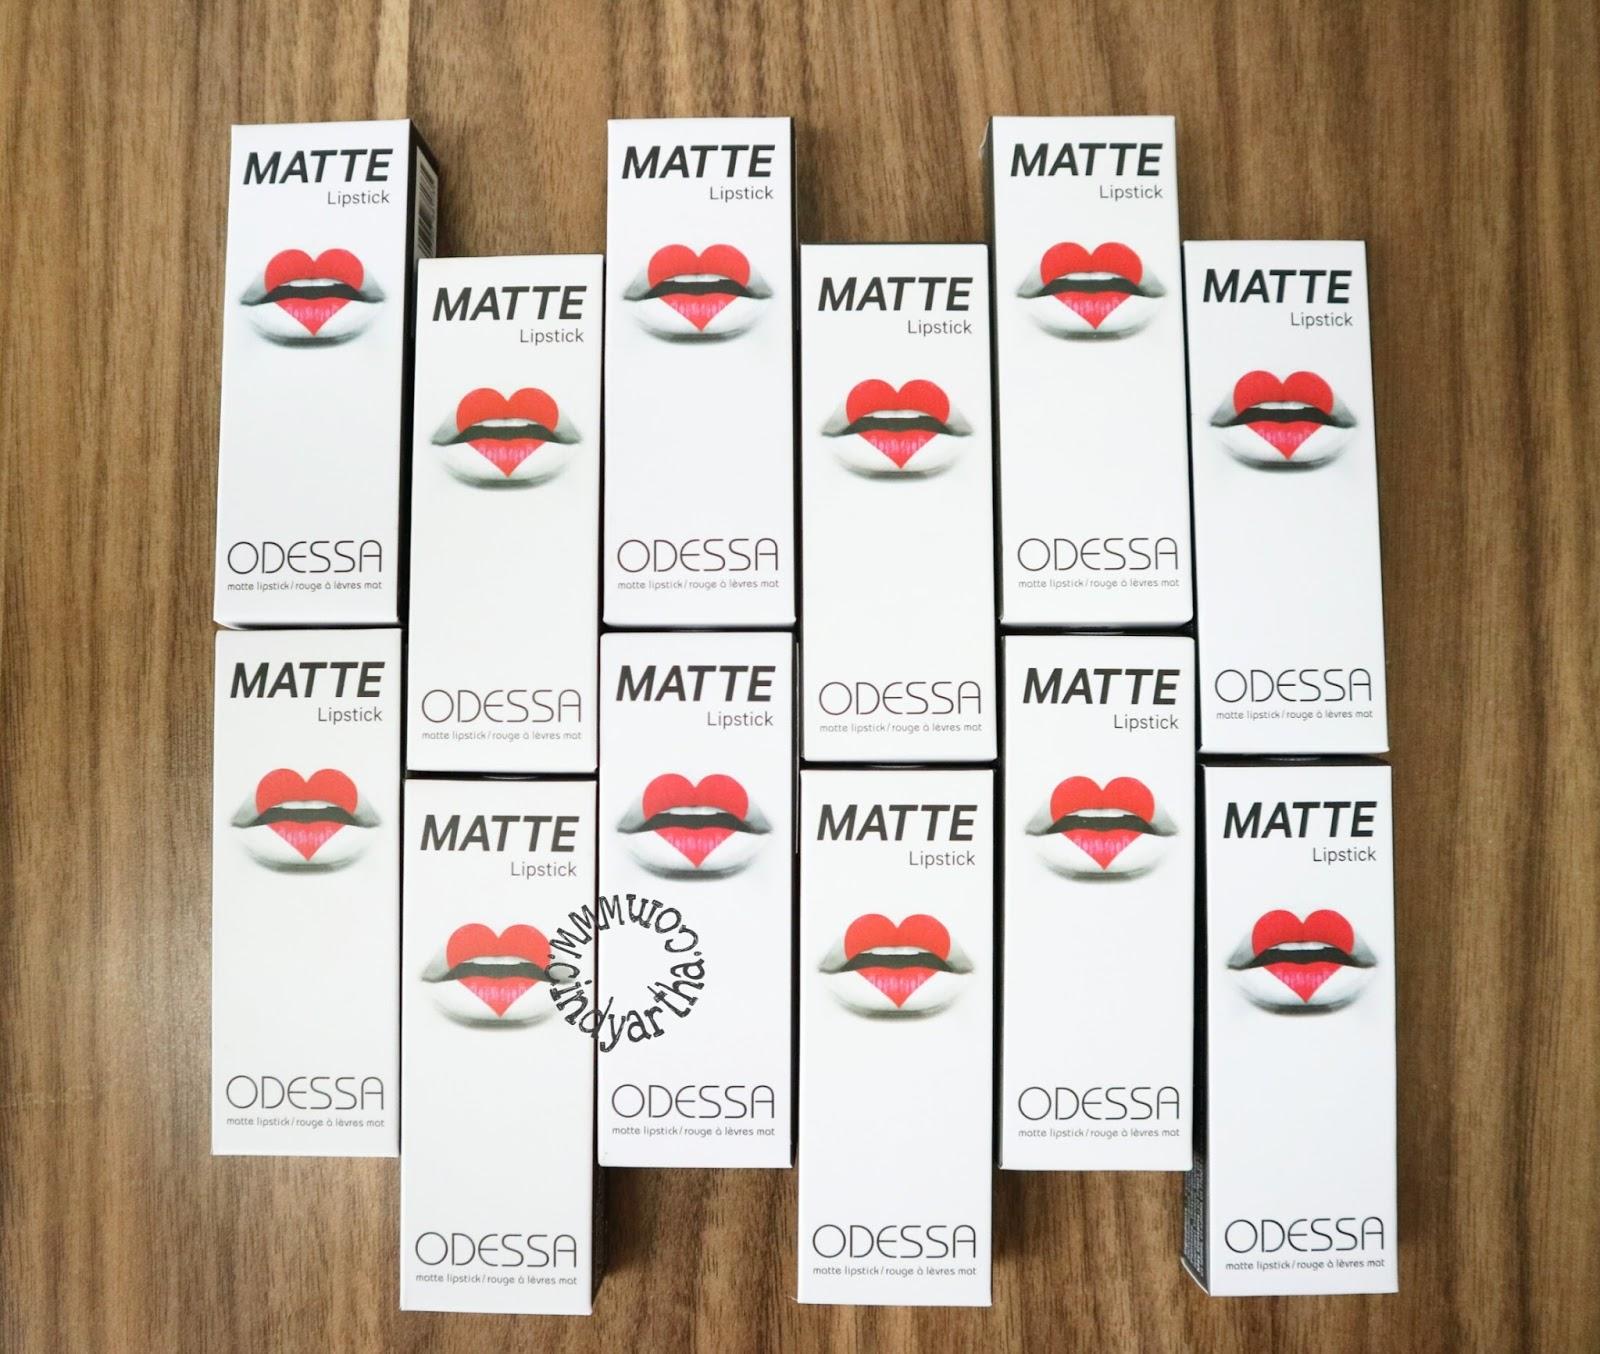 Odessa Matte Lipstick All Shades